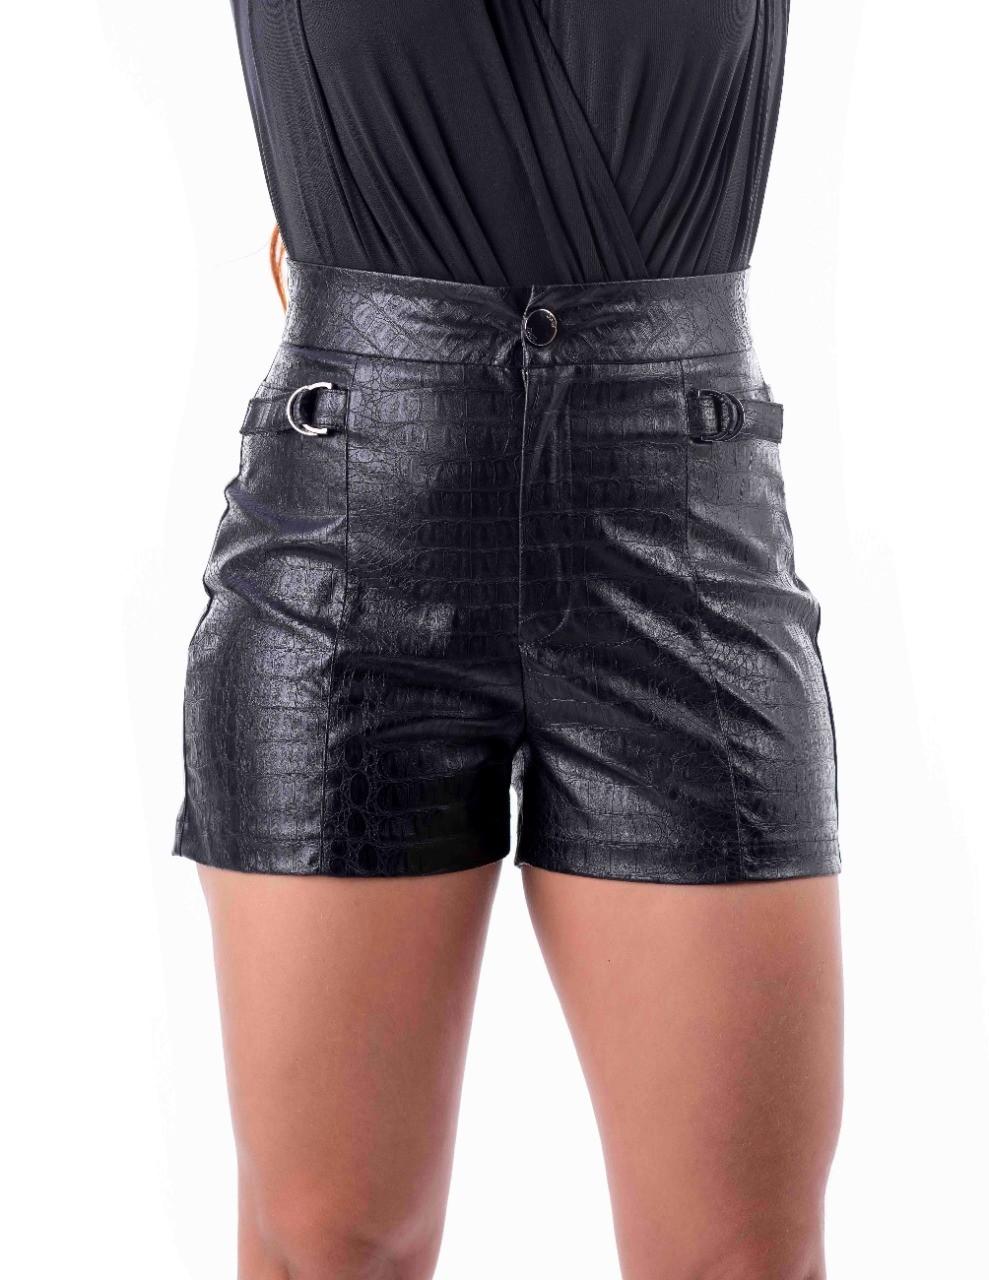 Shorts com detalhe de metal